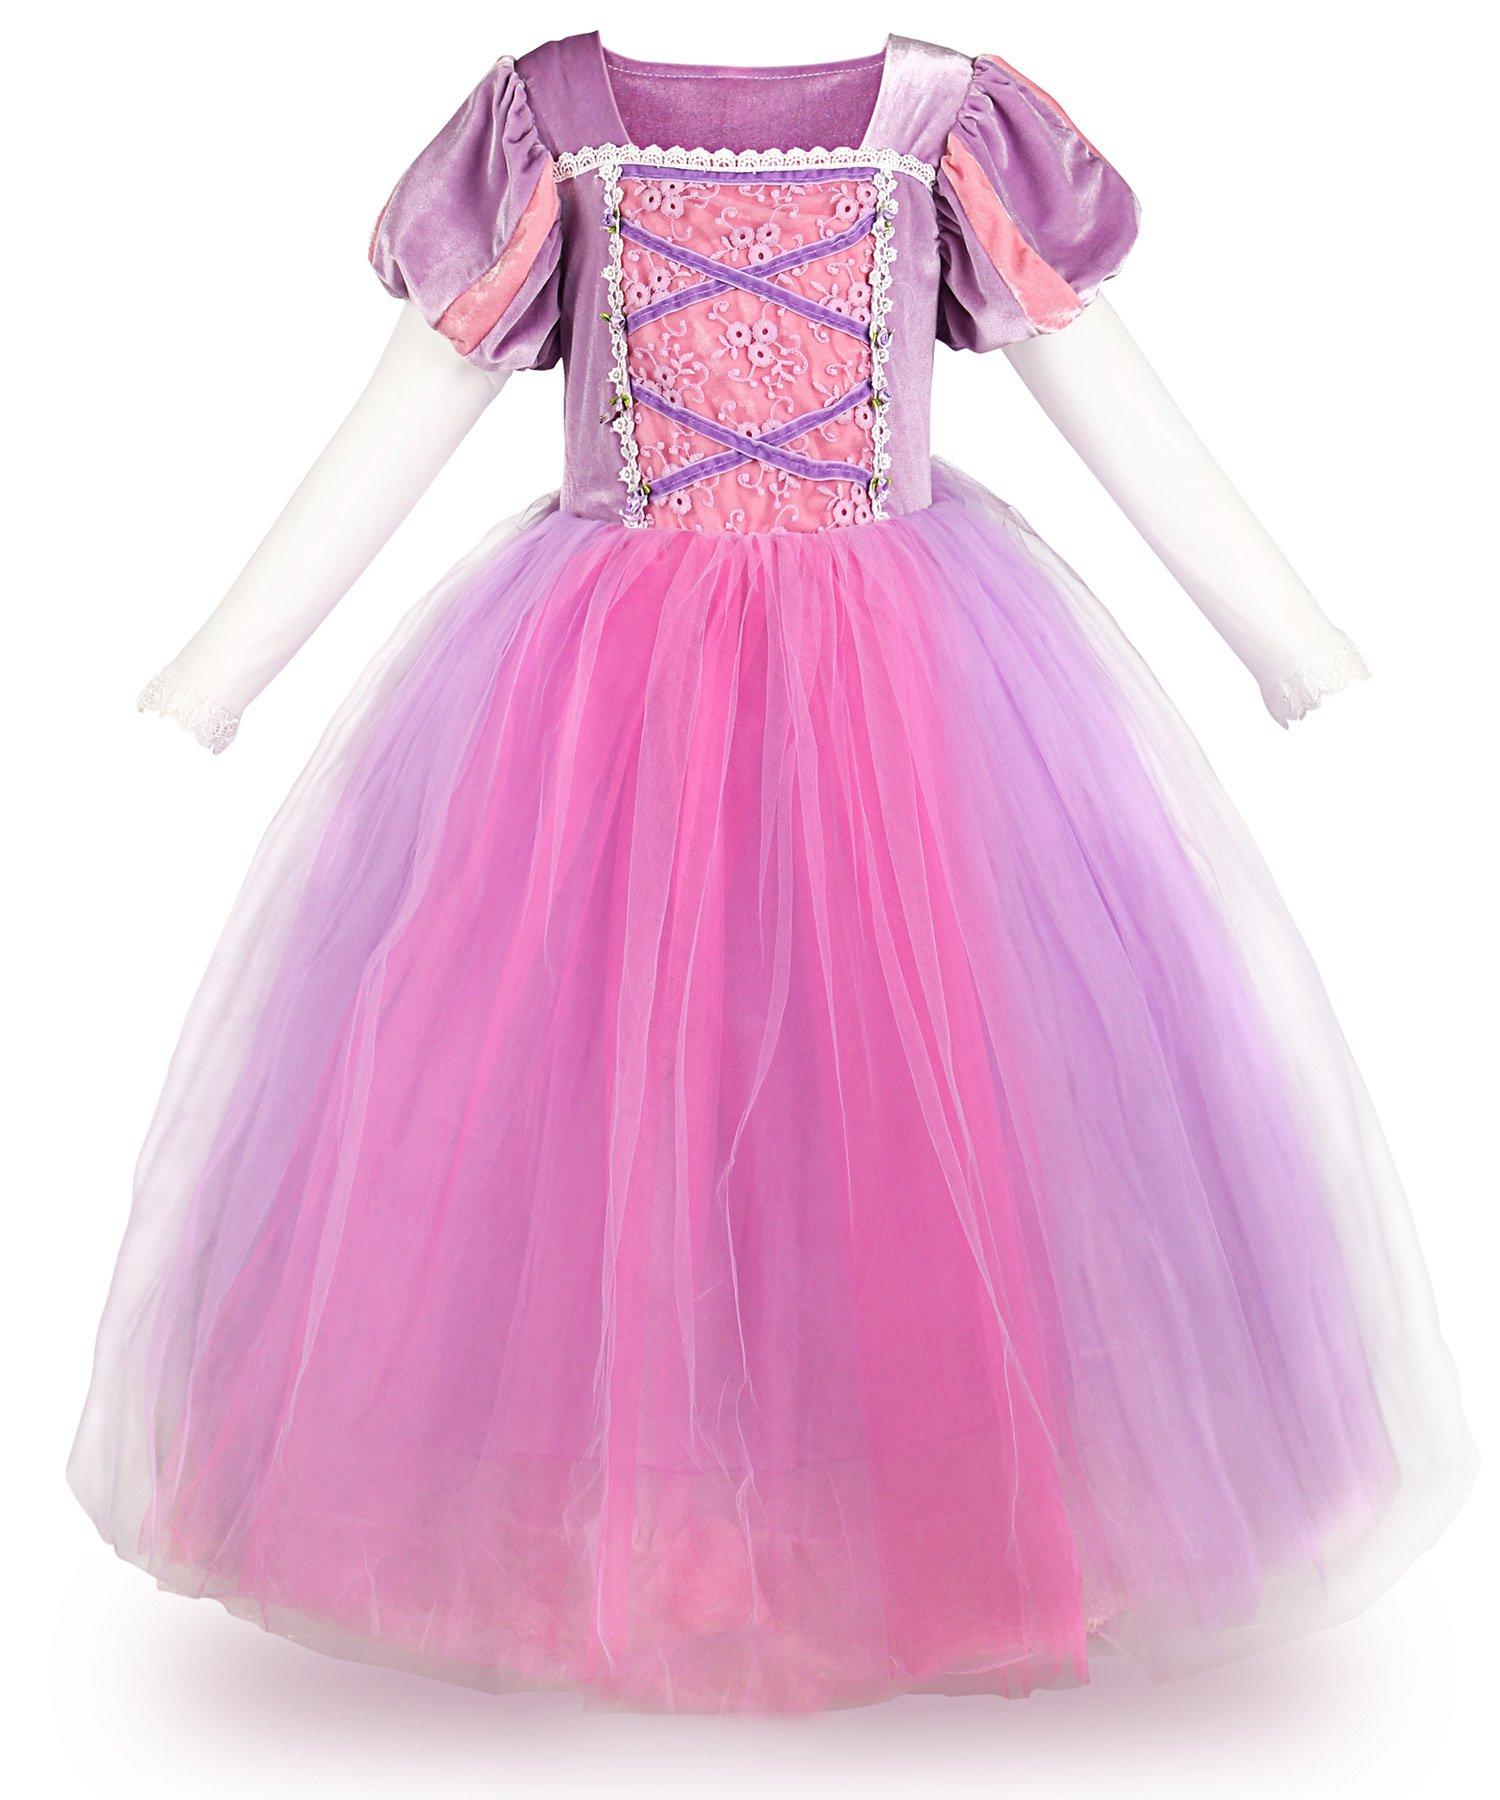 JerrisApparel Princess Rapunzel Mesh Long Sleeve Costume Girls Party Dress (7, Purple)